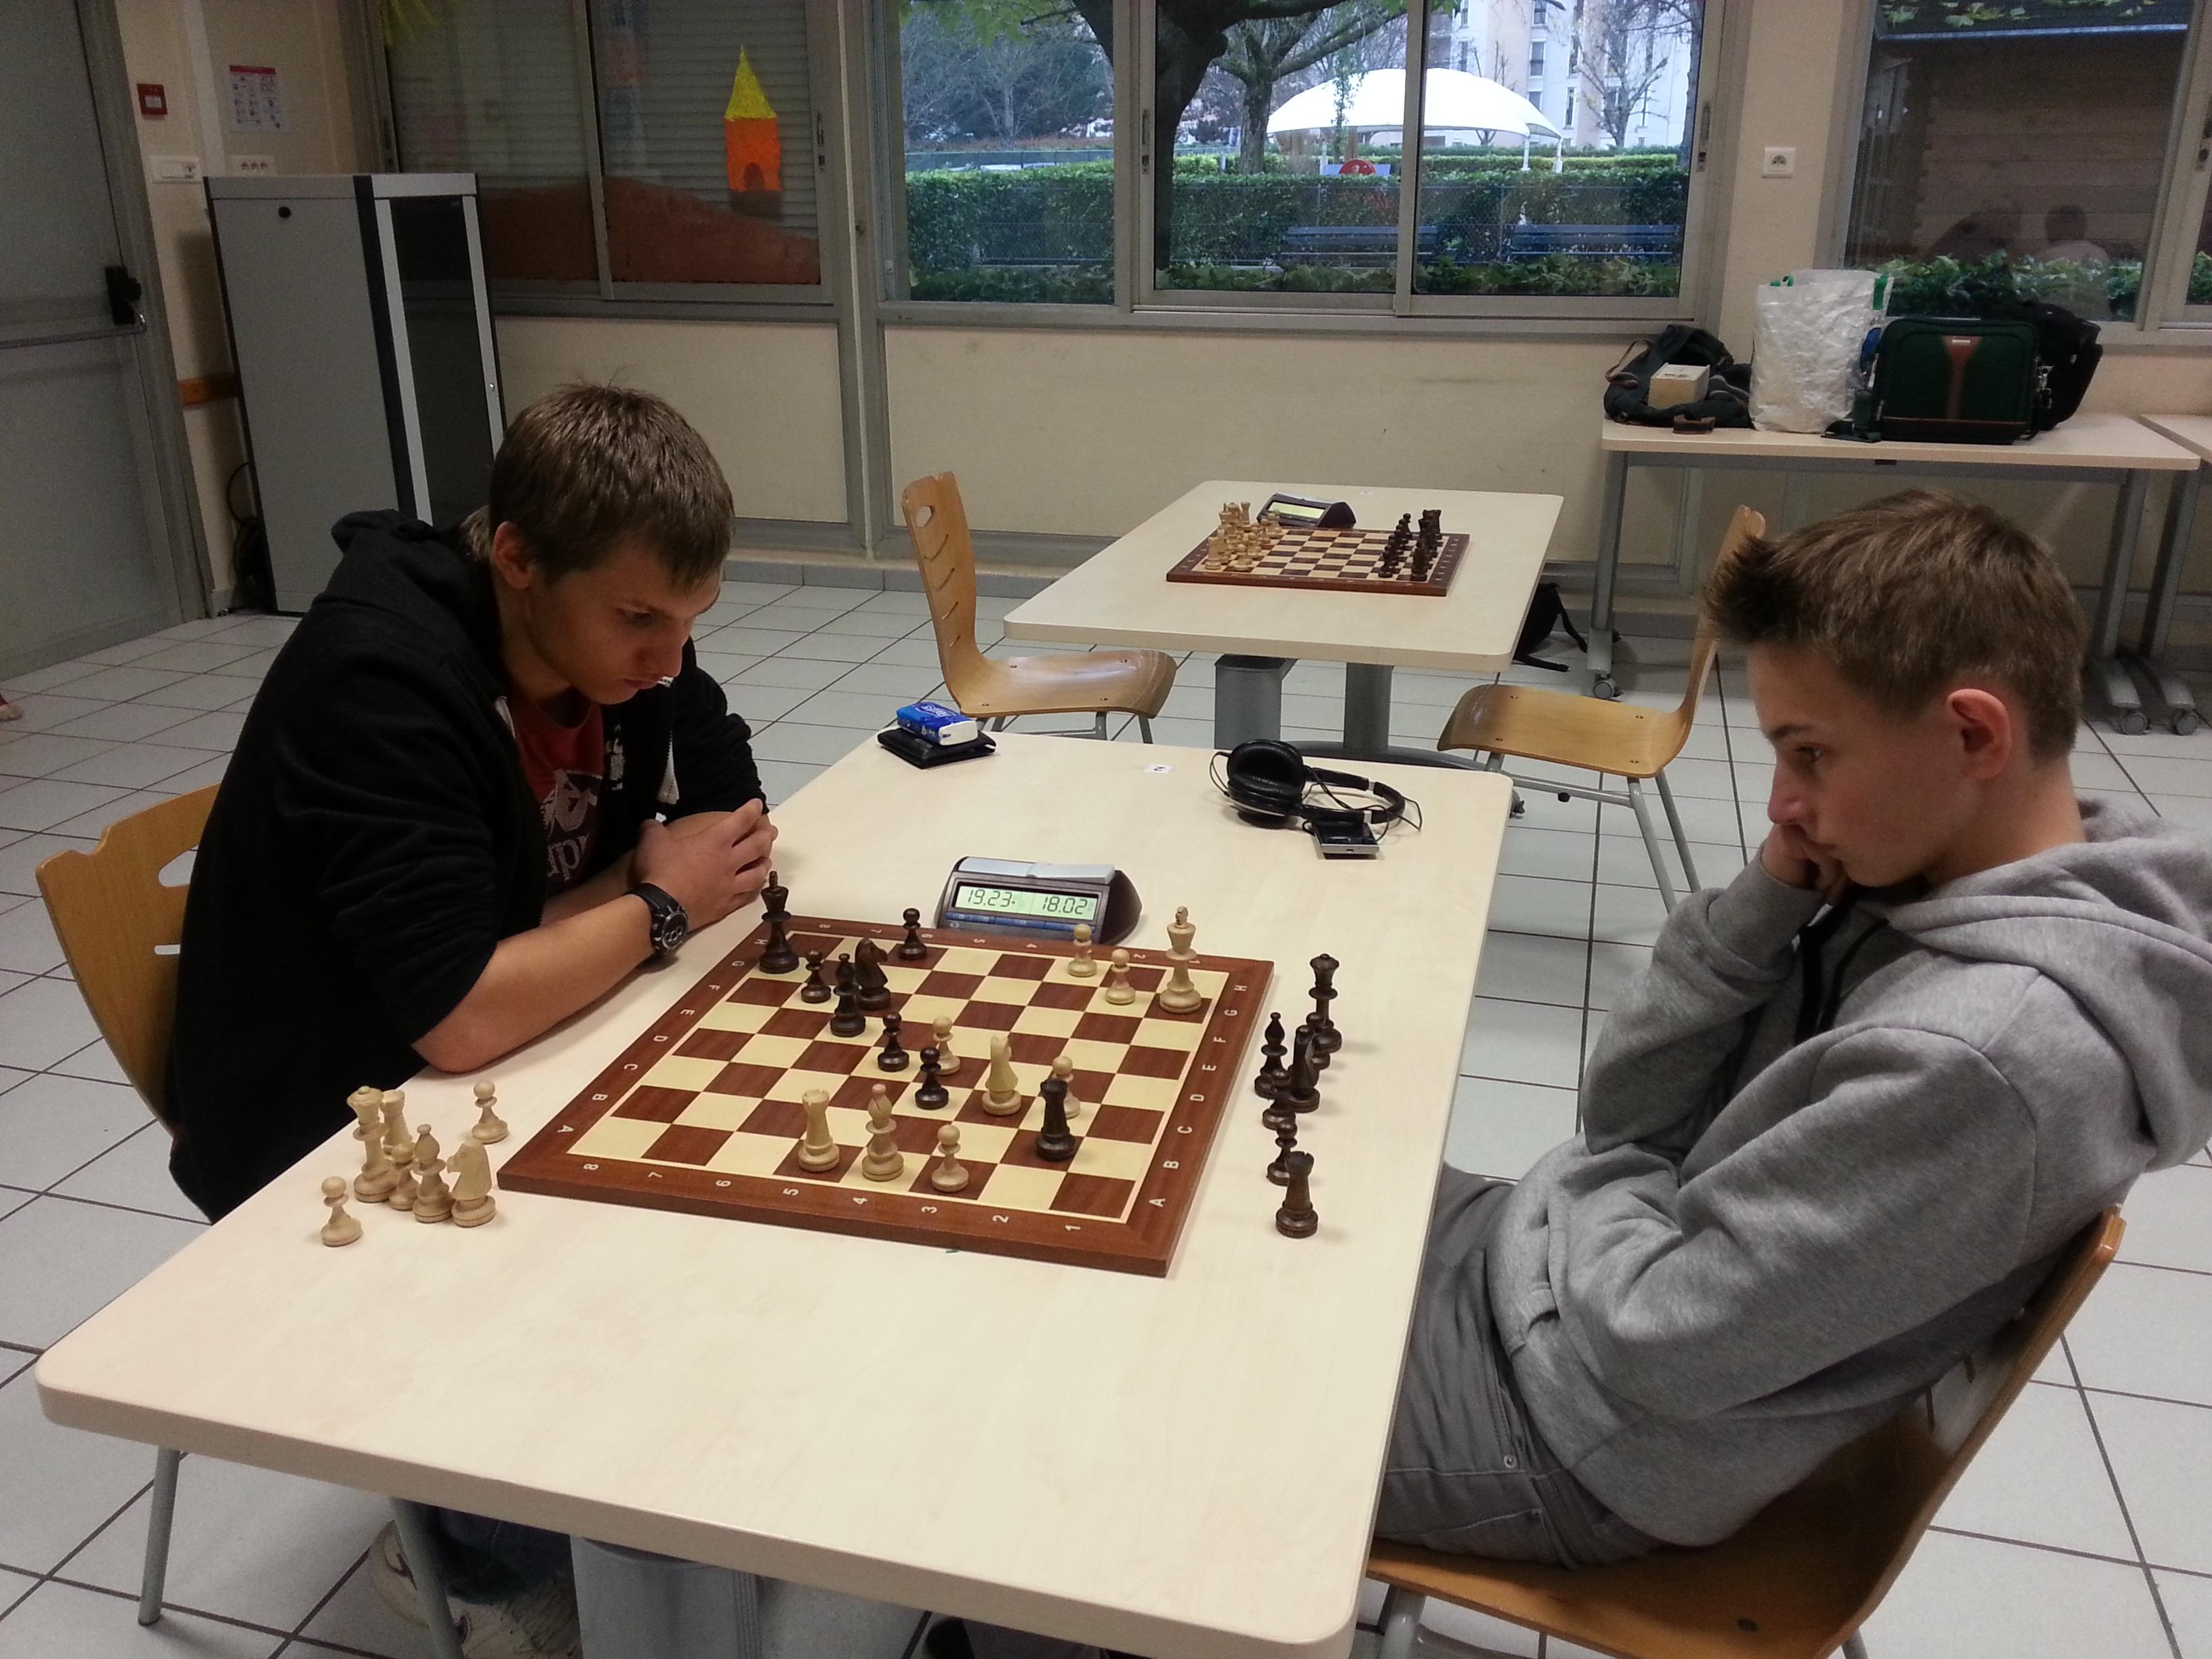 tournoi-interne-6-decembre-2014-academie-echecs-philidor-4